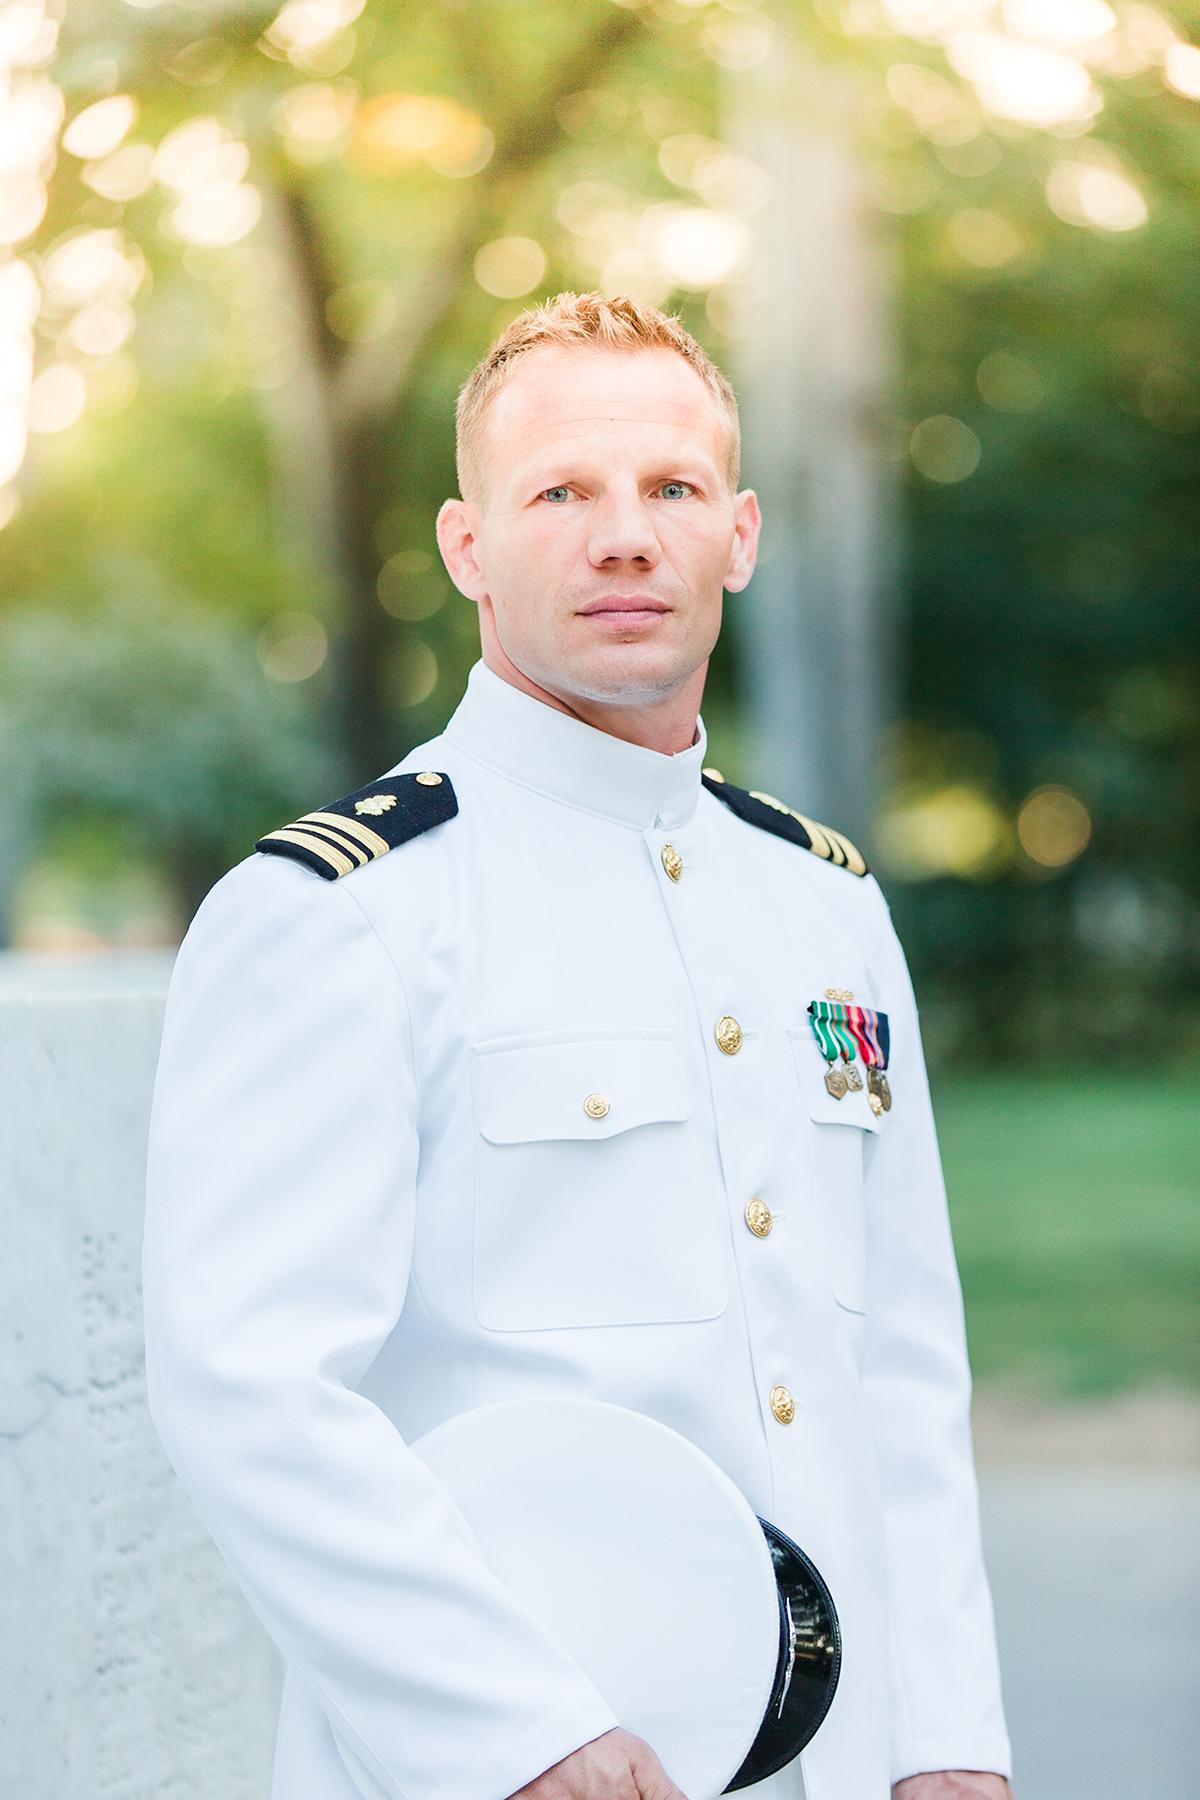 Intimate-Military-Elopement-groom-portrait.jpg